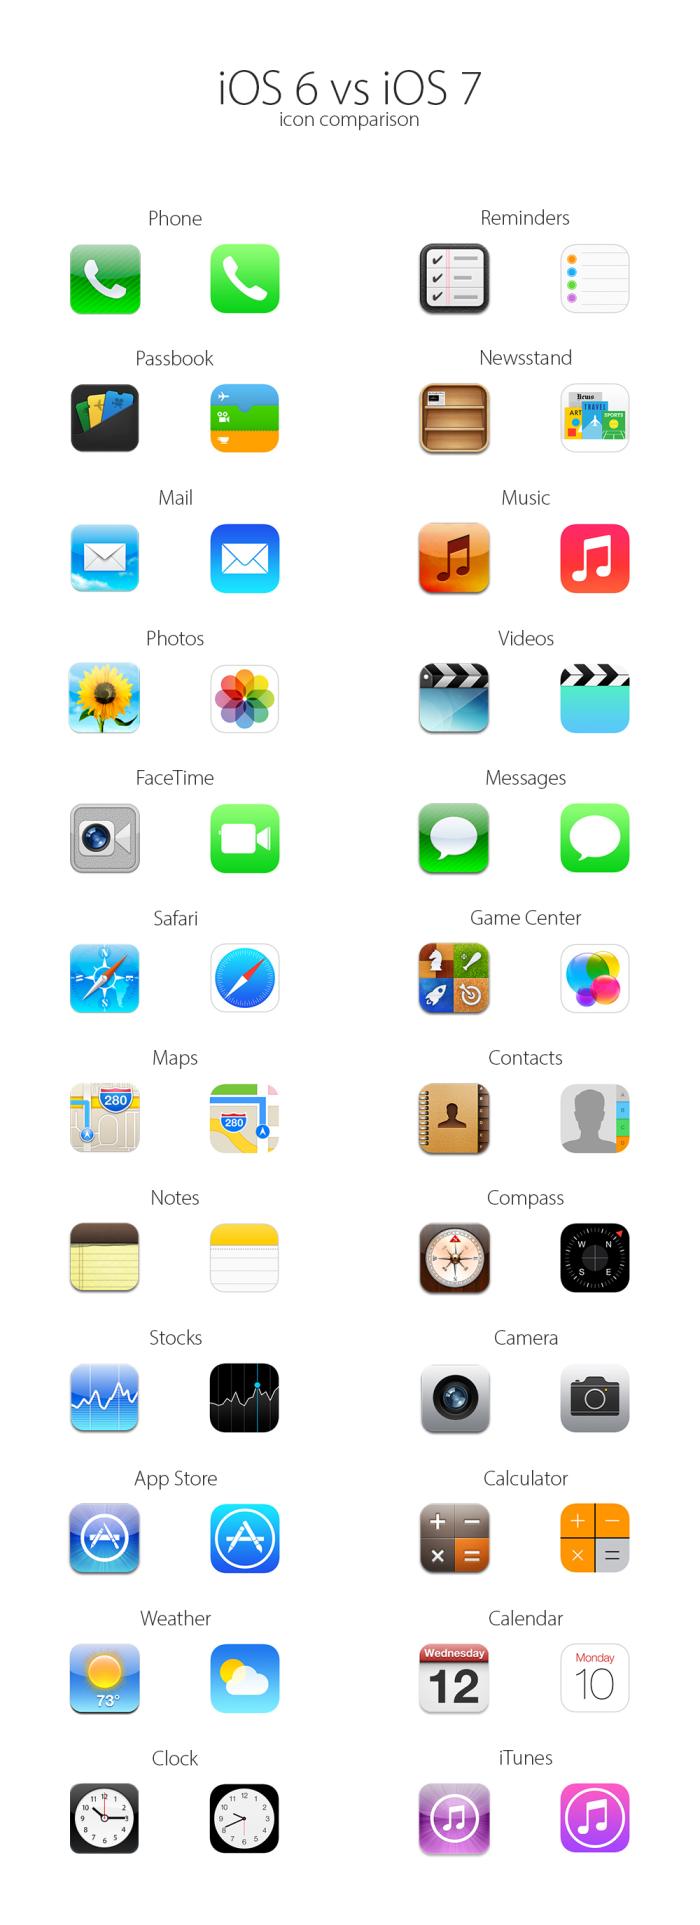 iOS-6-vs-iOS-7-icons